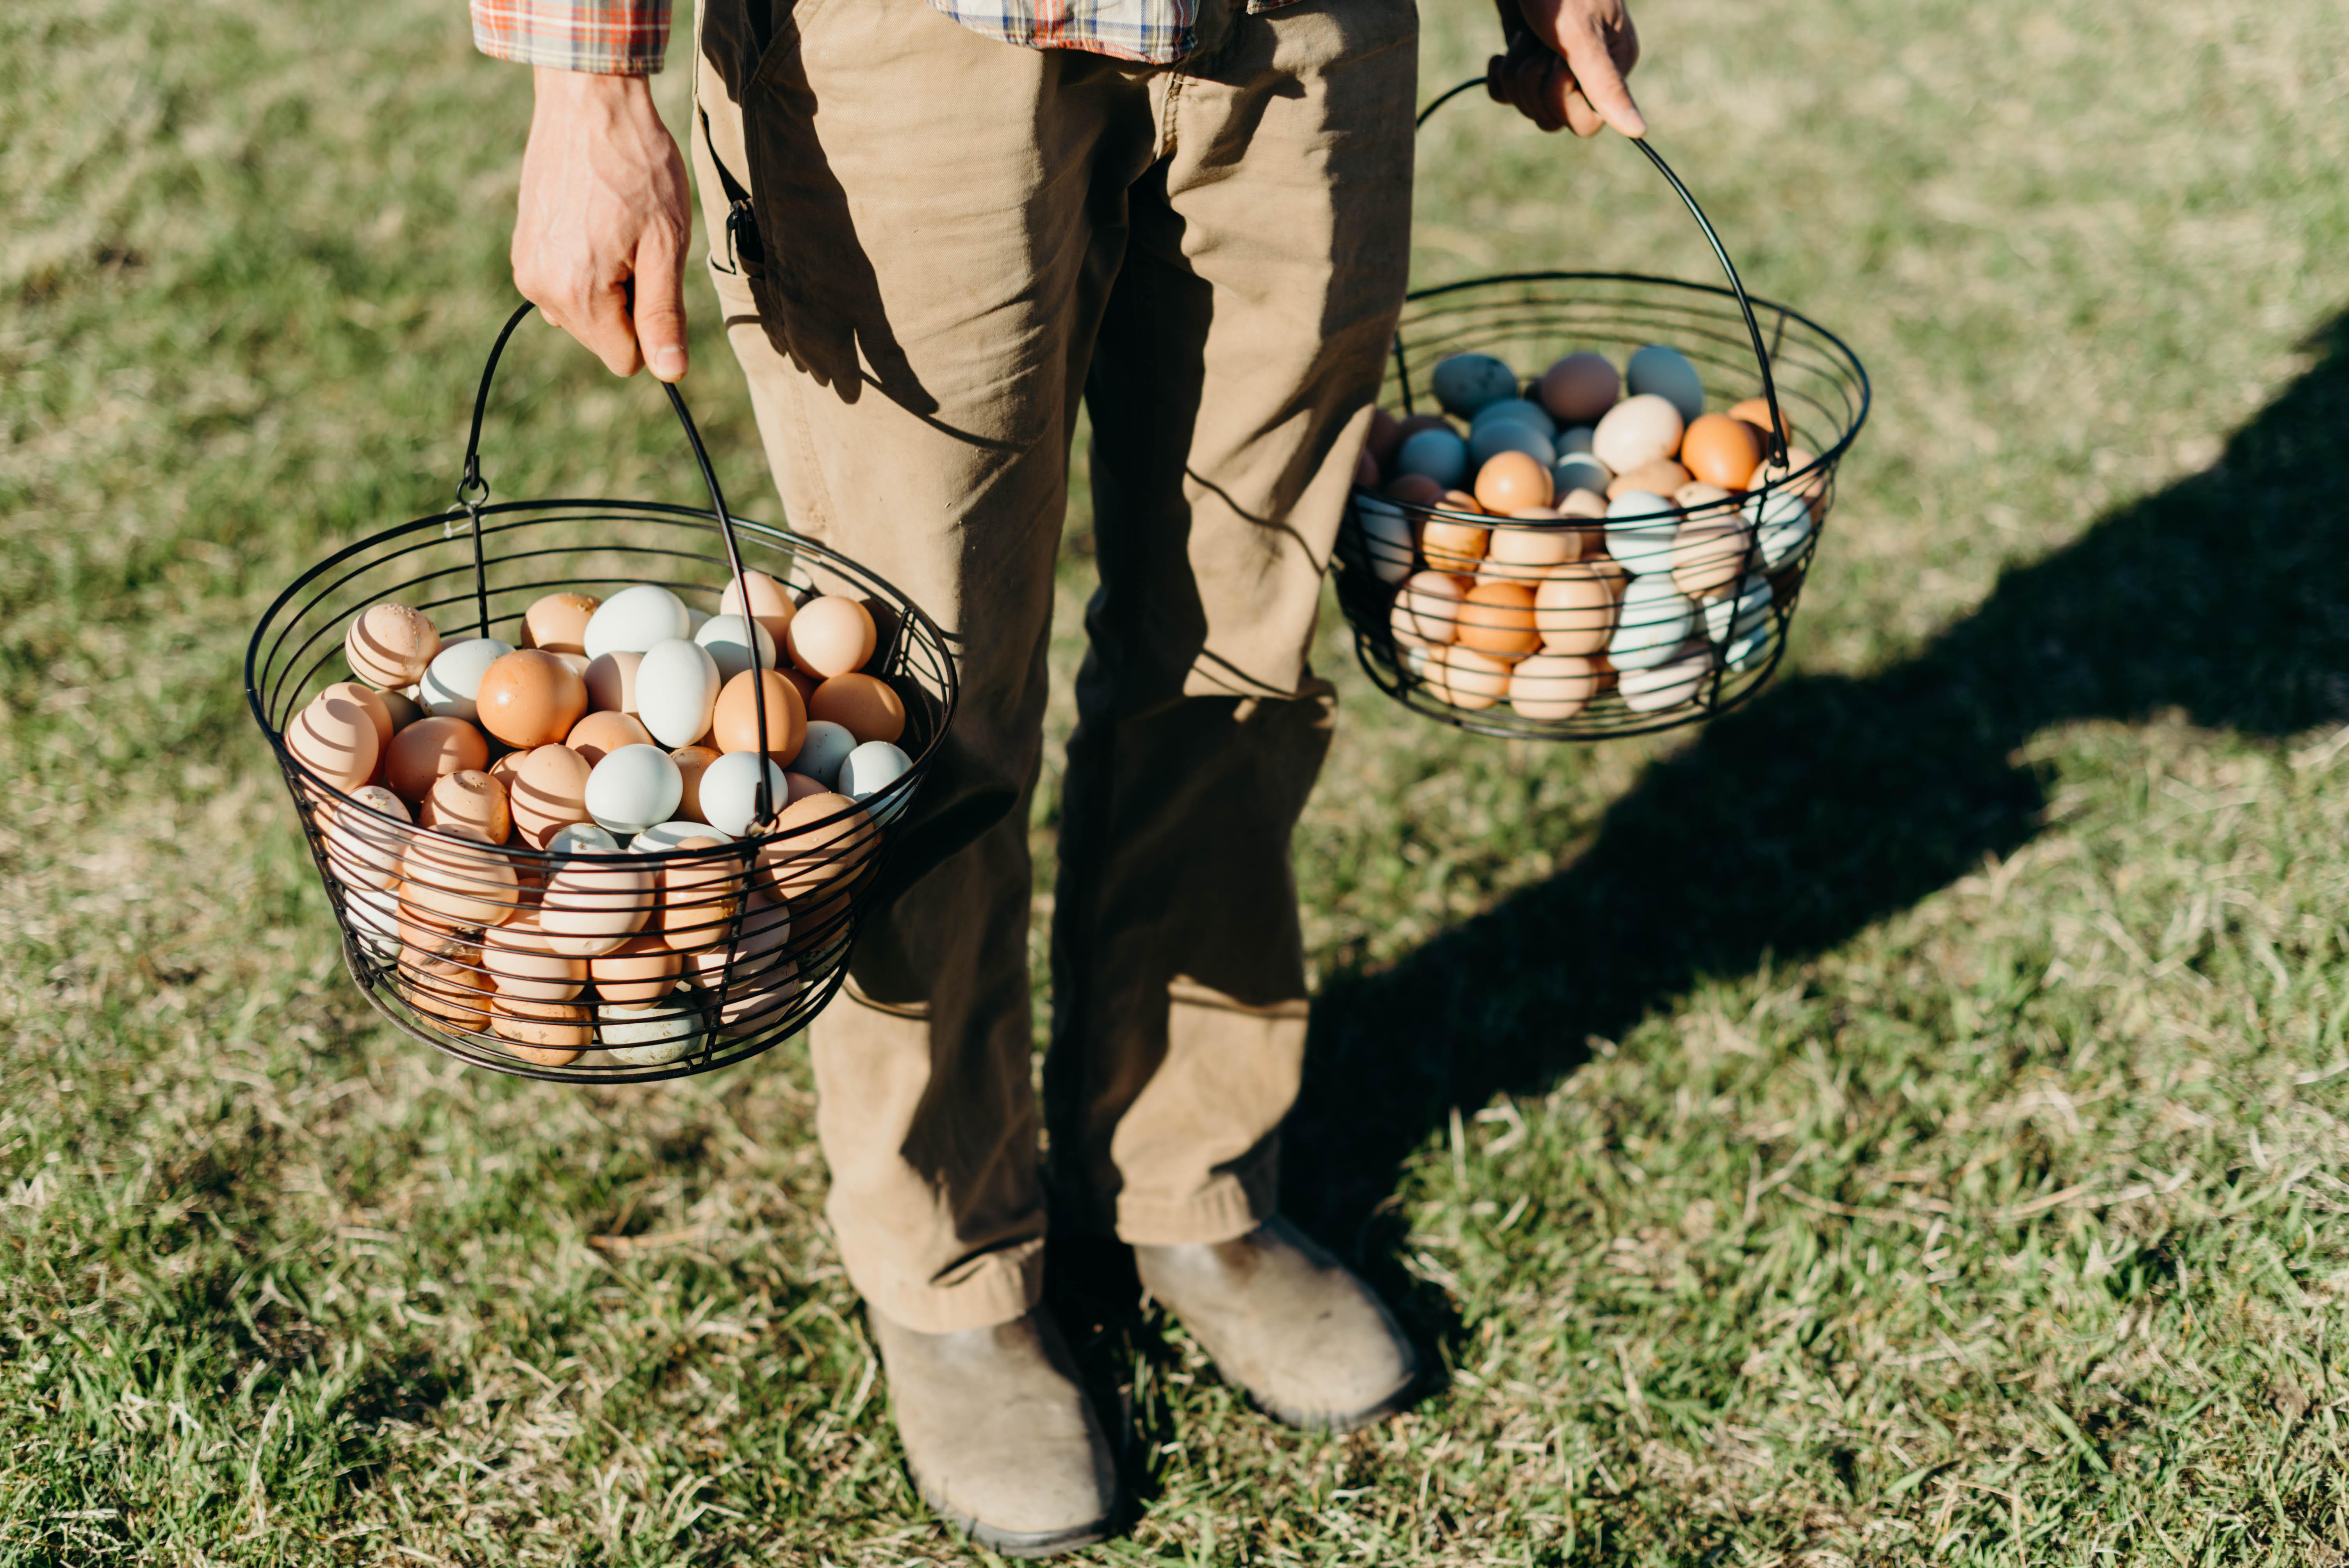 Winter Eggs - One dozen